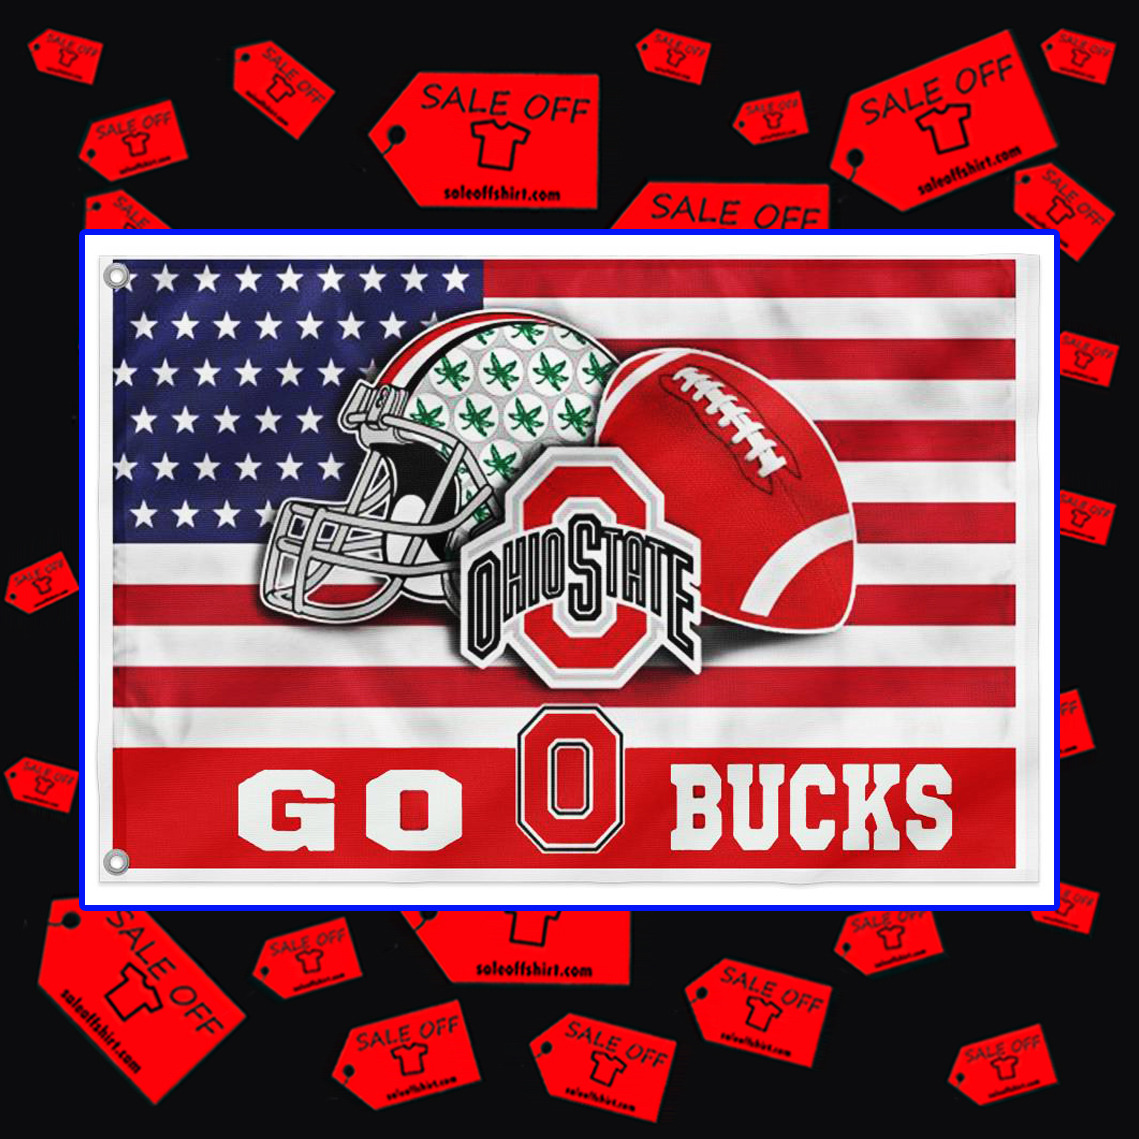 Ohio State Buckeyes Go Bucks flag 24x36